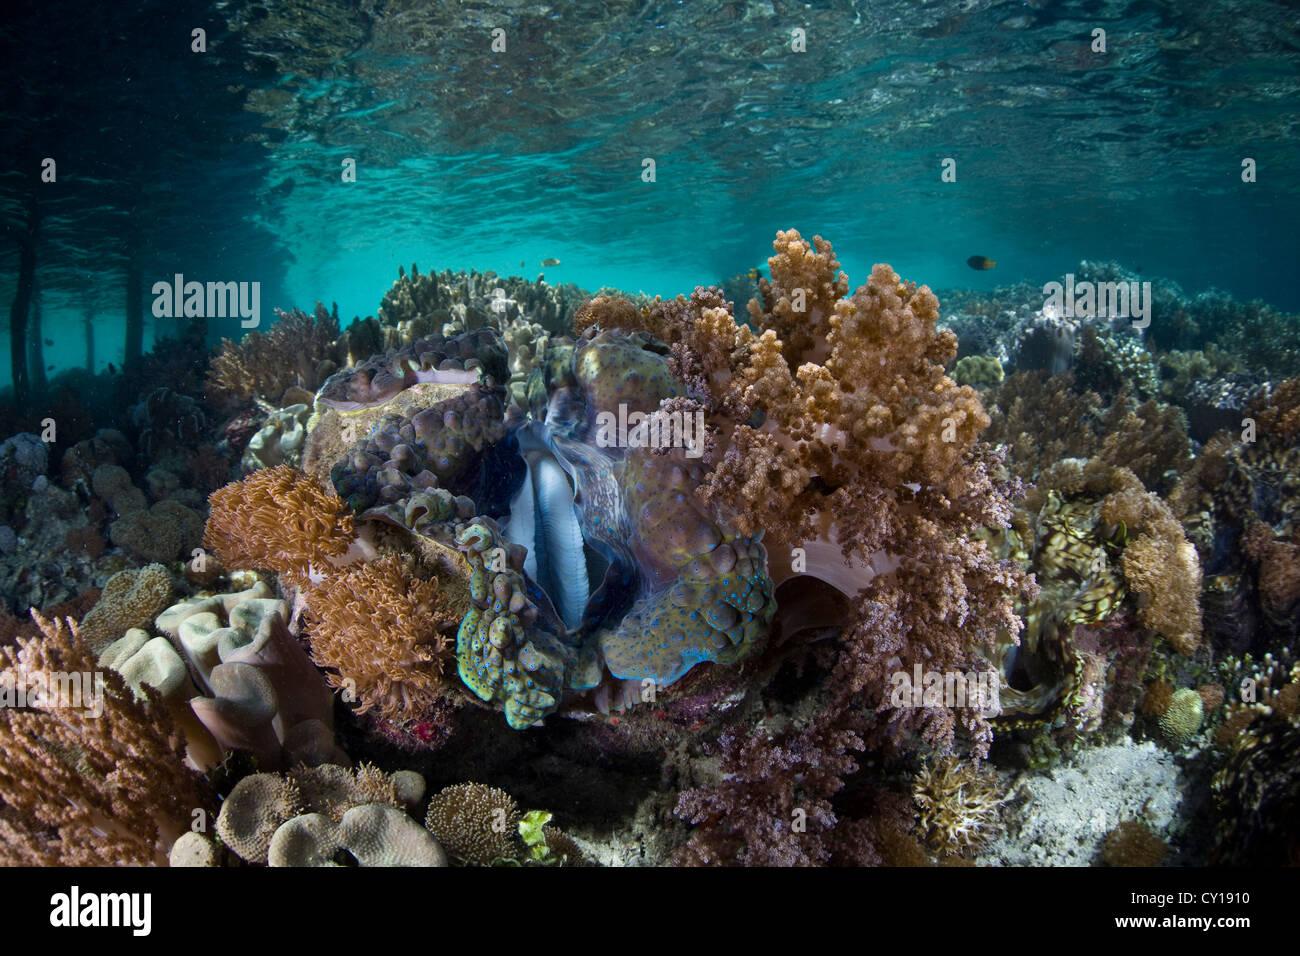 Giant Clam, Tridacna squamosa, Misool, West Papua, Indonesia Stock Photo